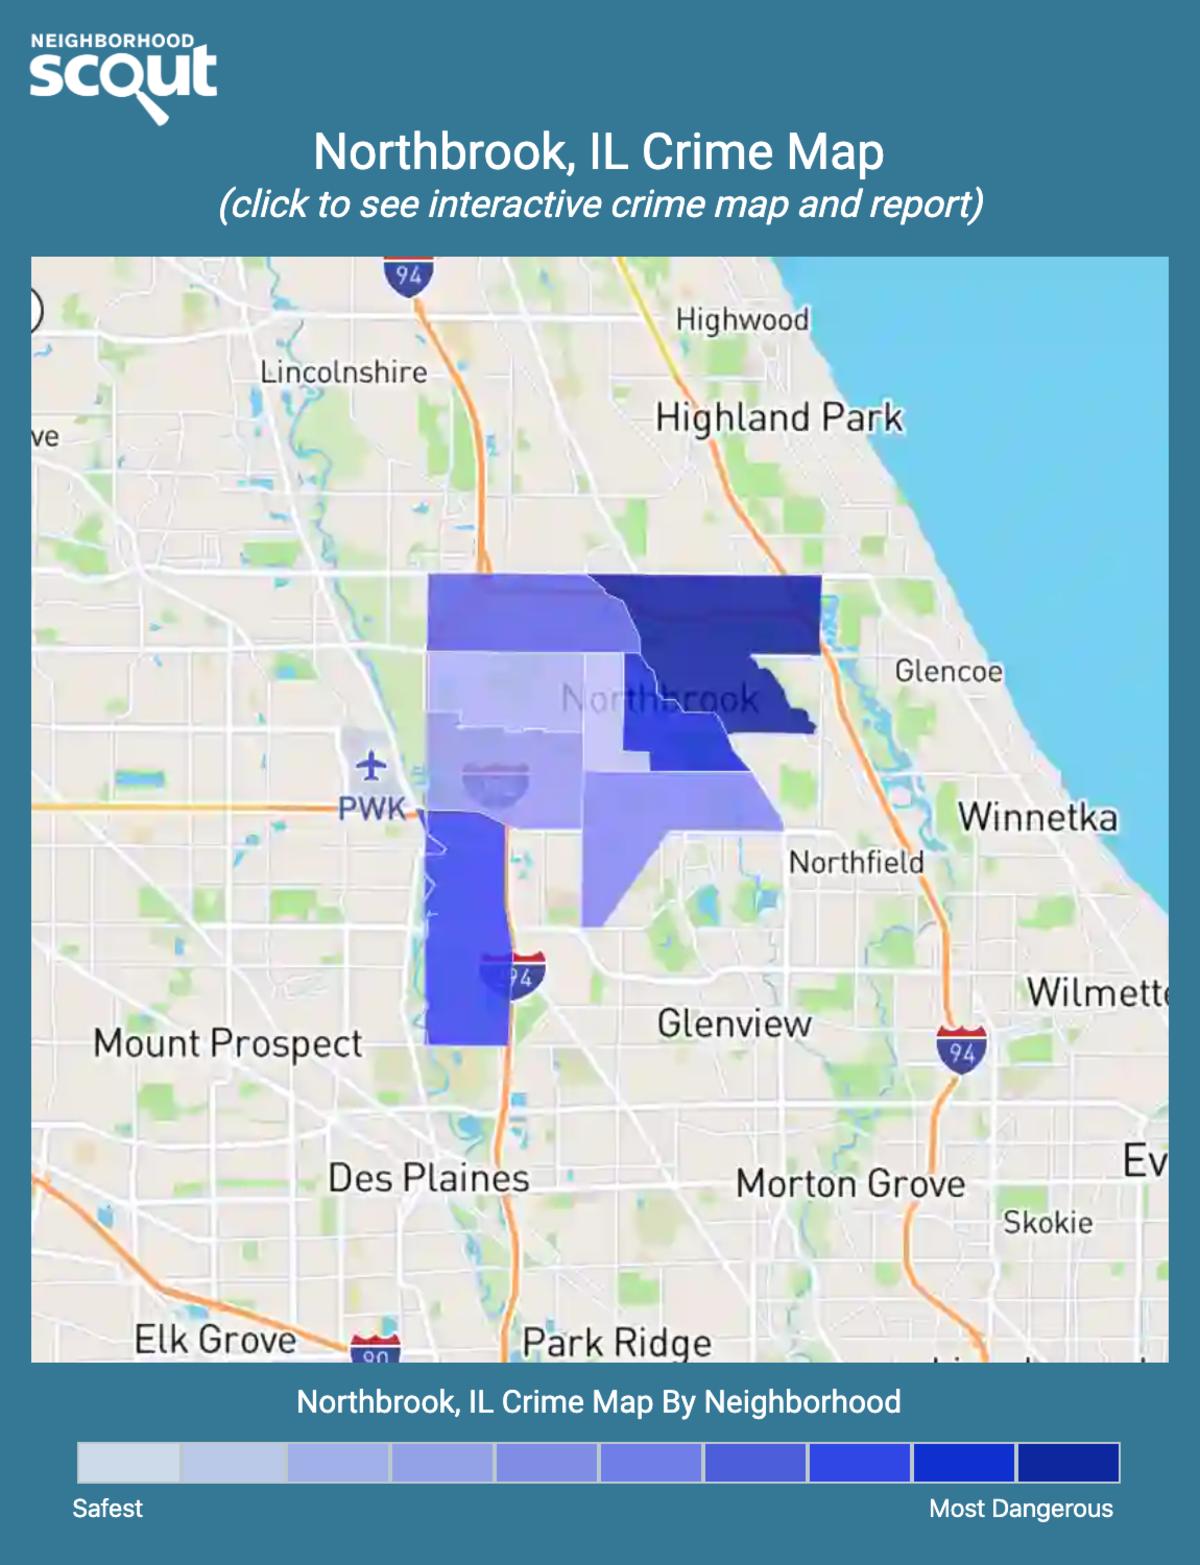 Northbrook, Illinois crime map